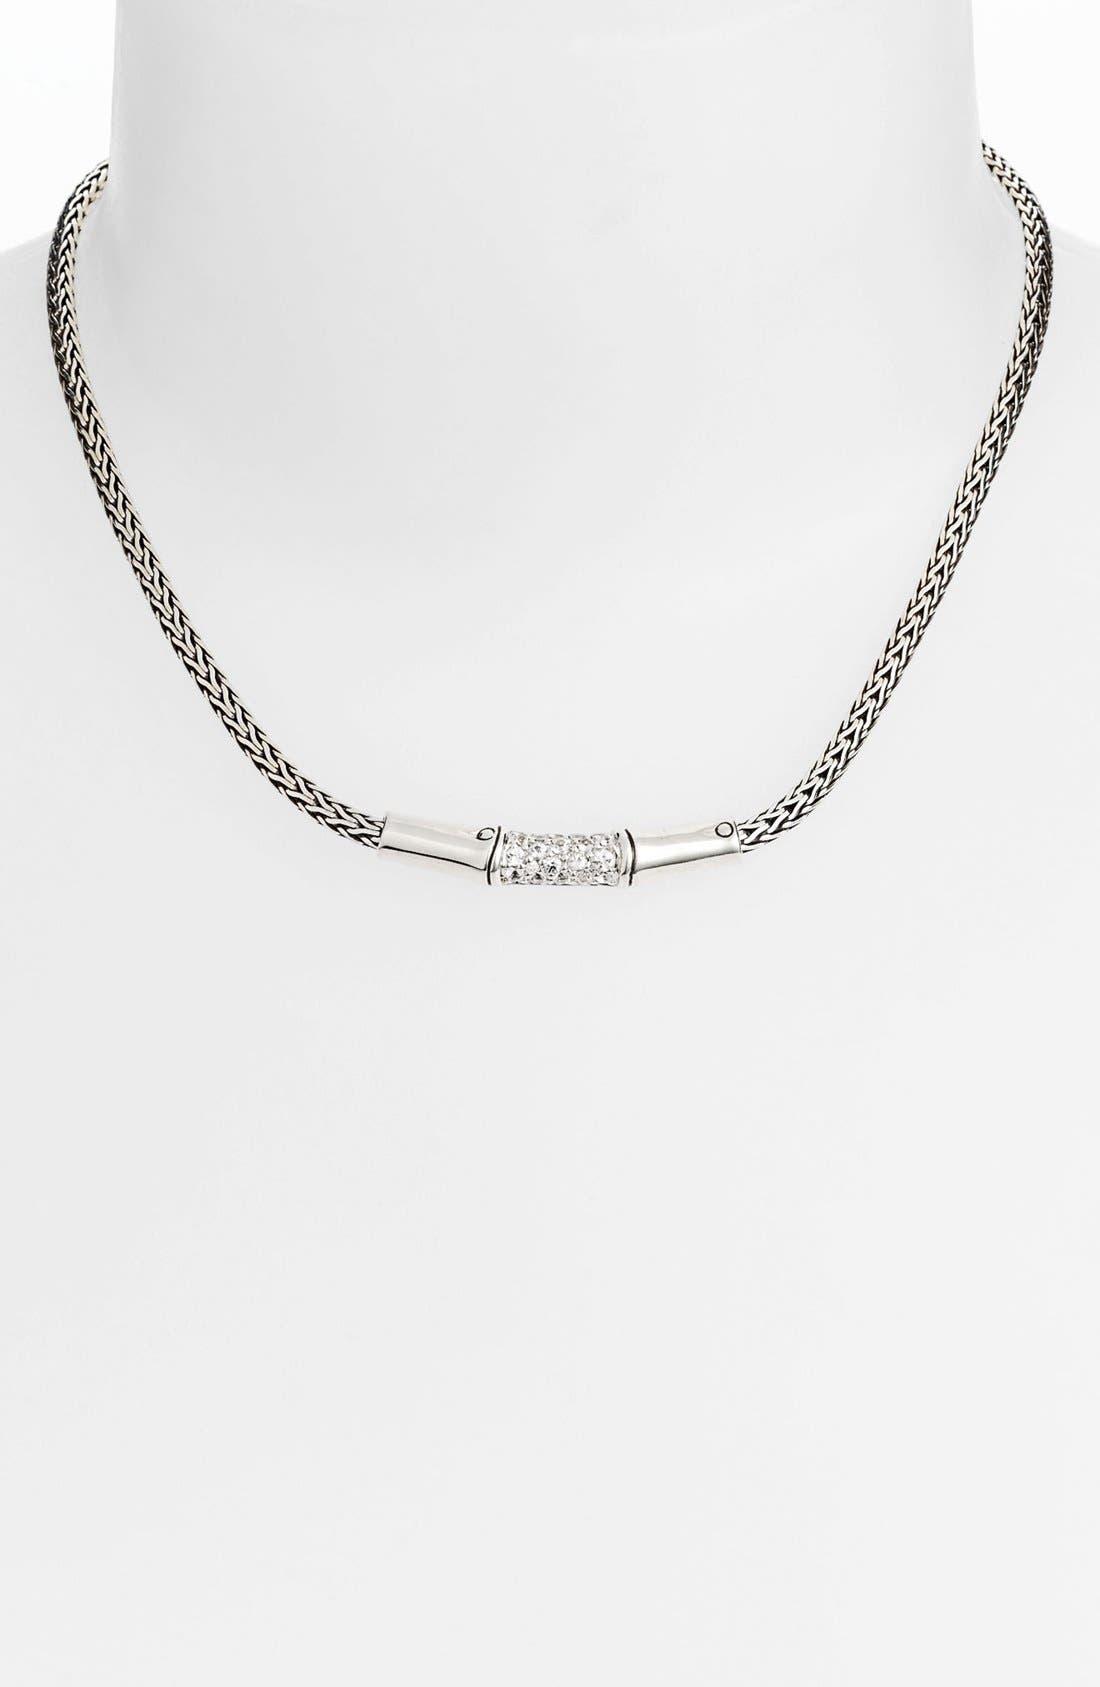 Main Image - John Hardy 'Bamboo - Lava' Chain Necklace